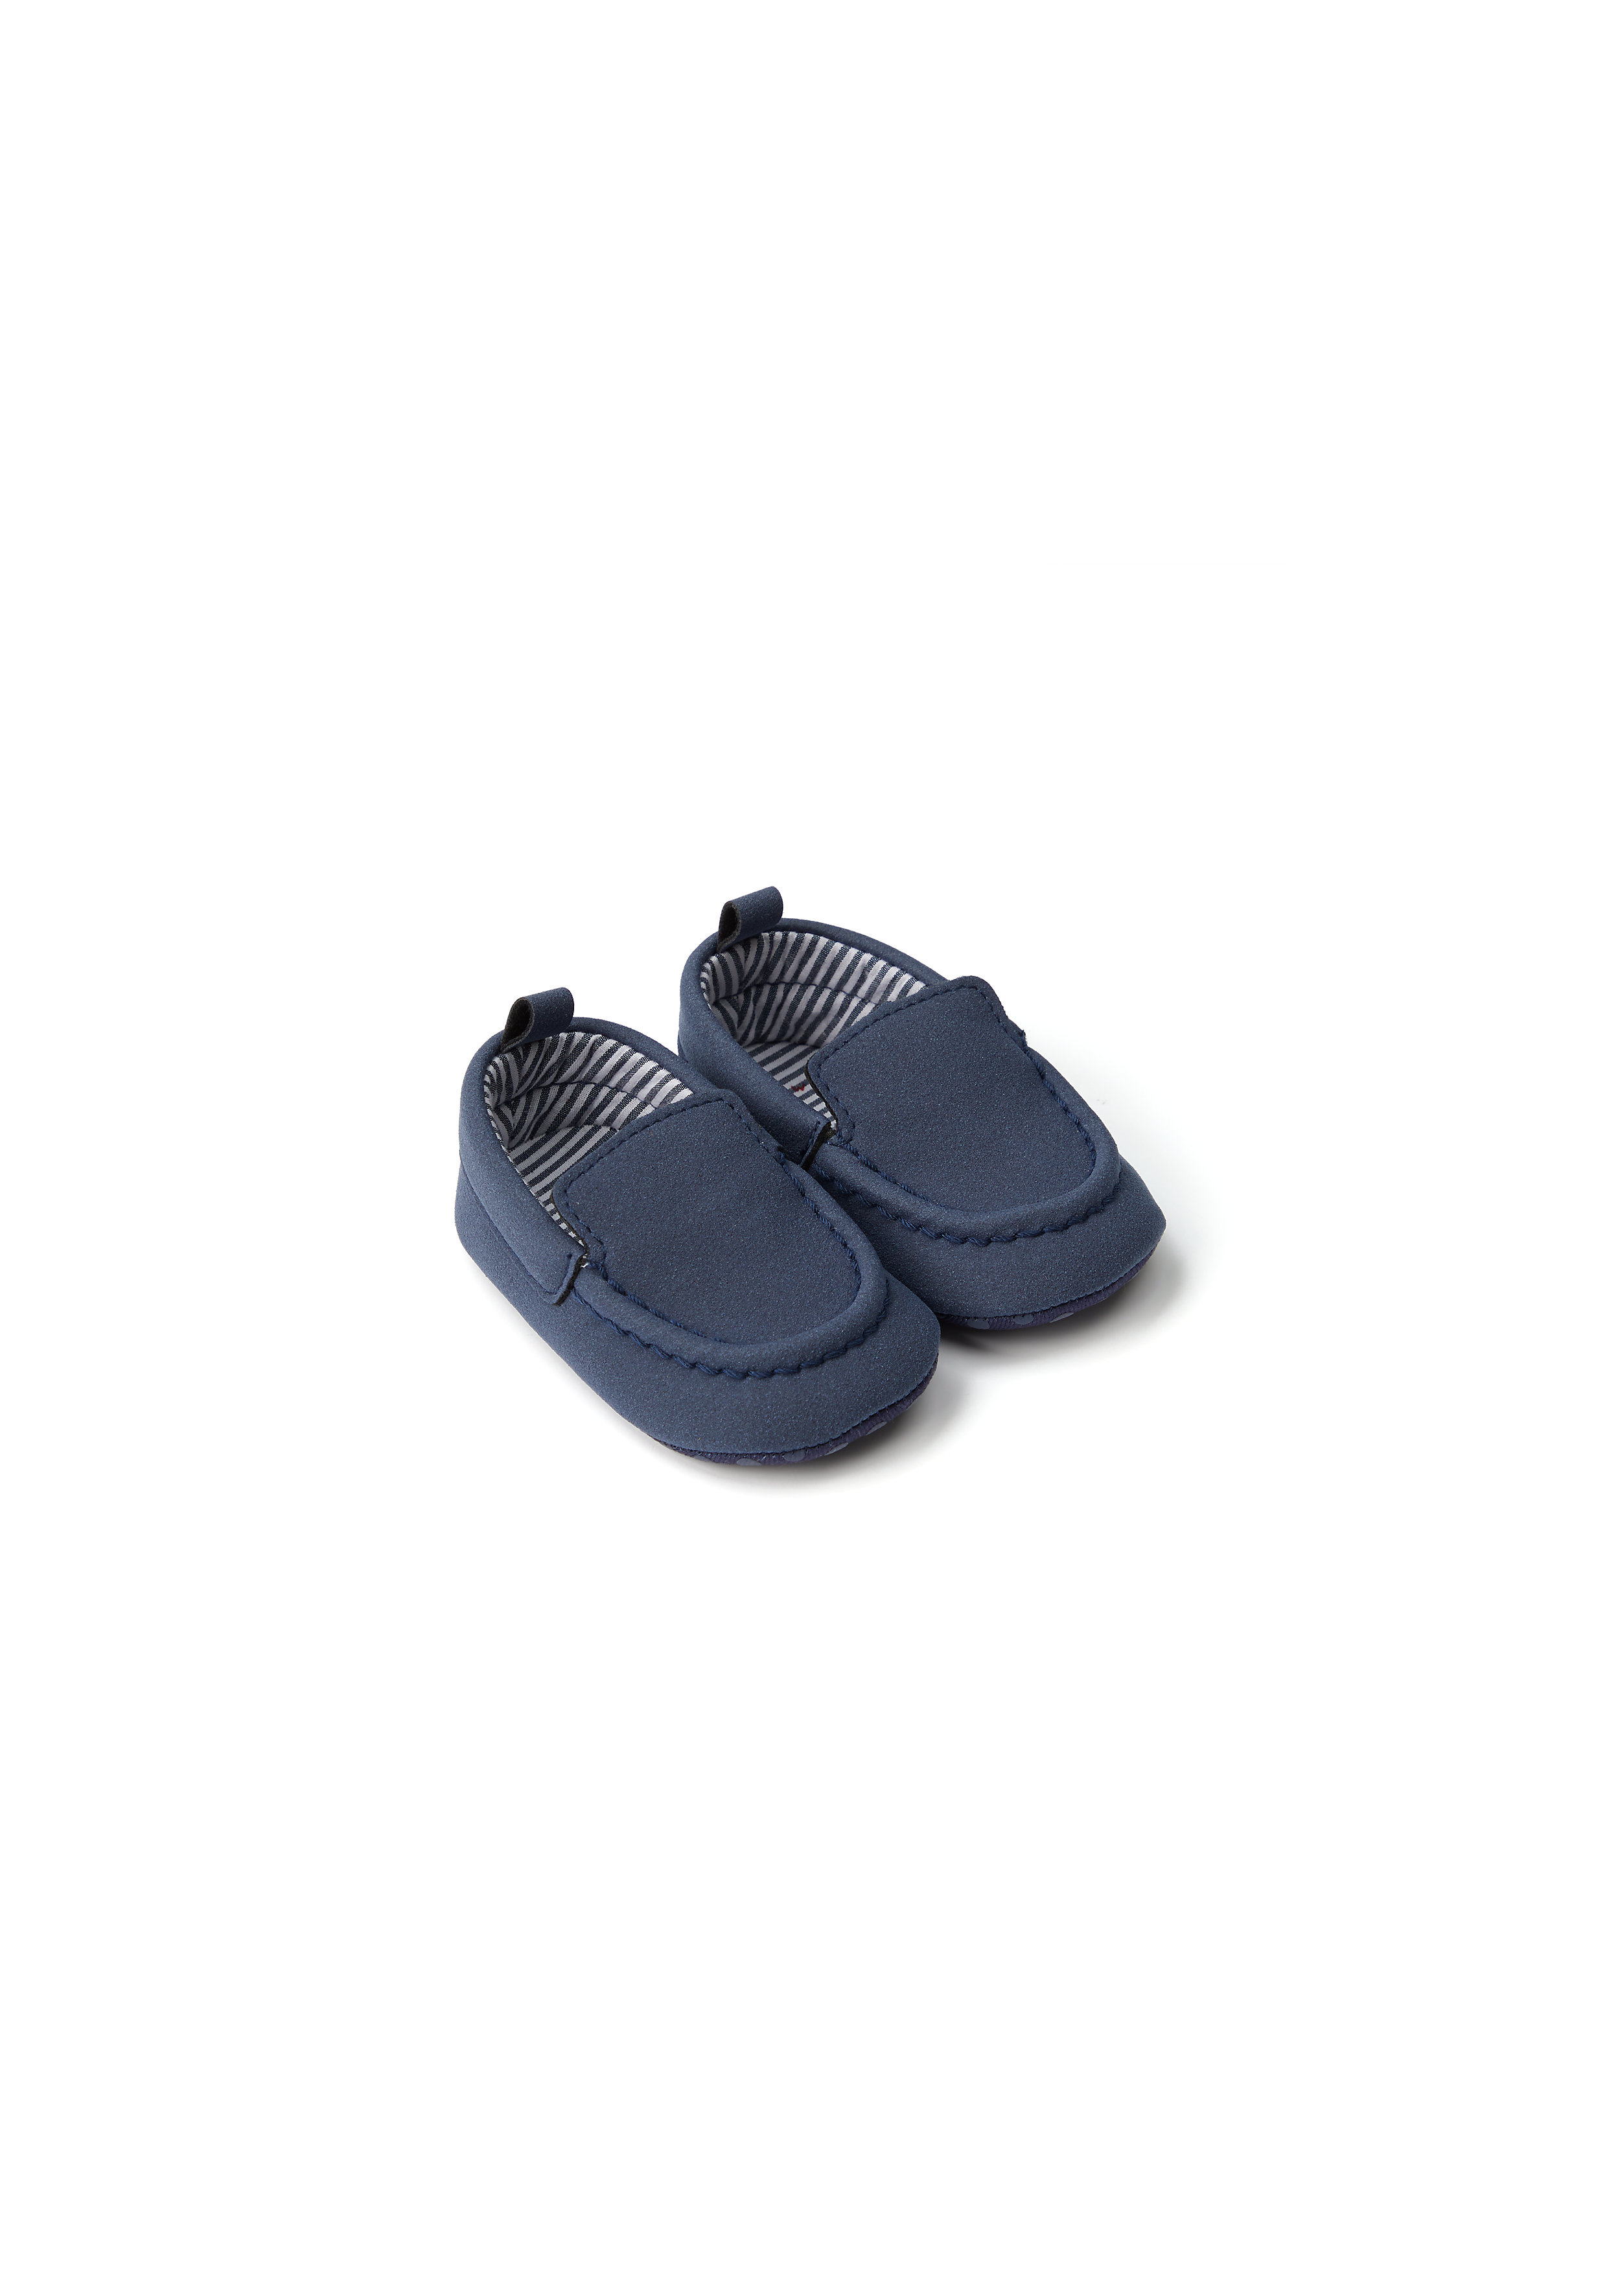 Mothercare | Boys Pram Shoes  - Navy